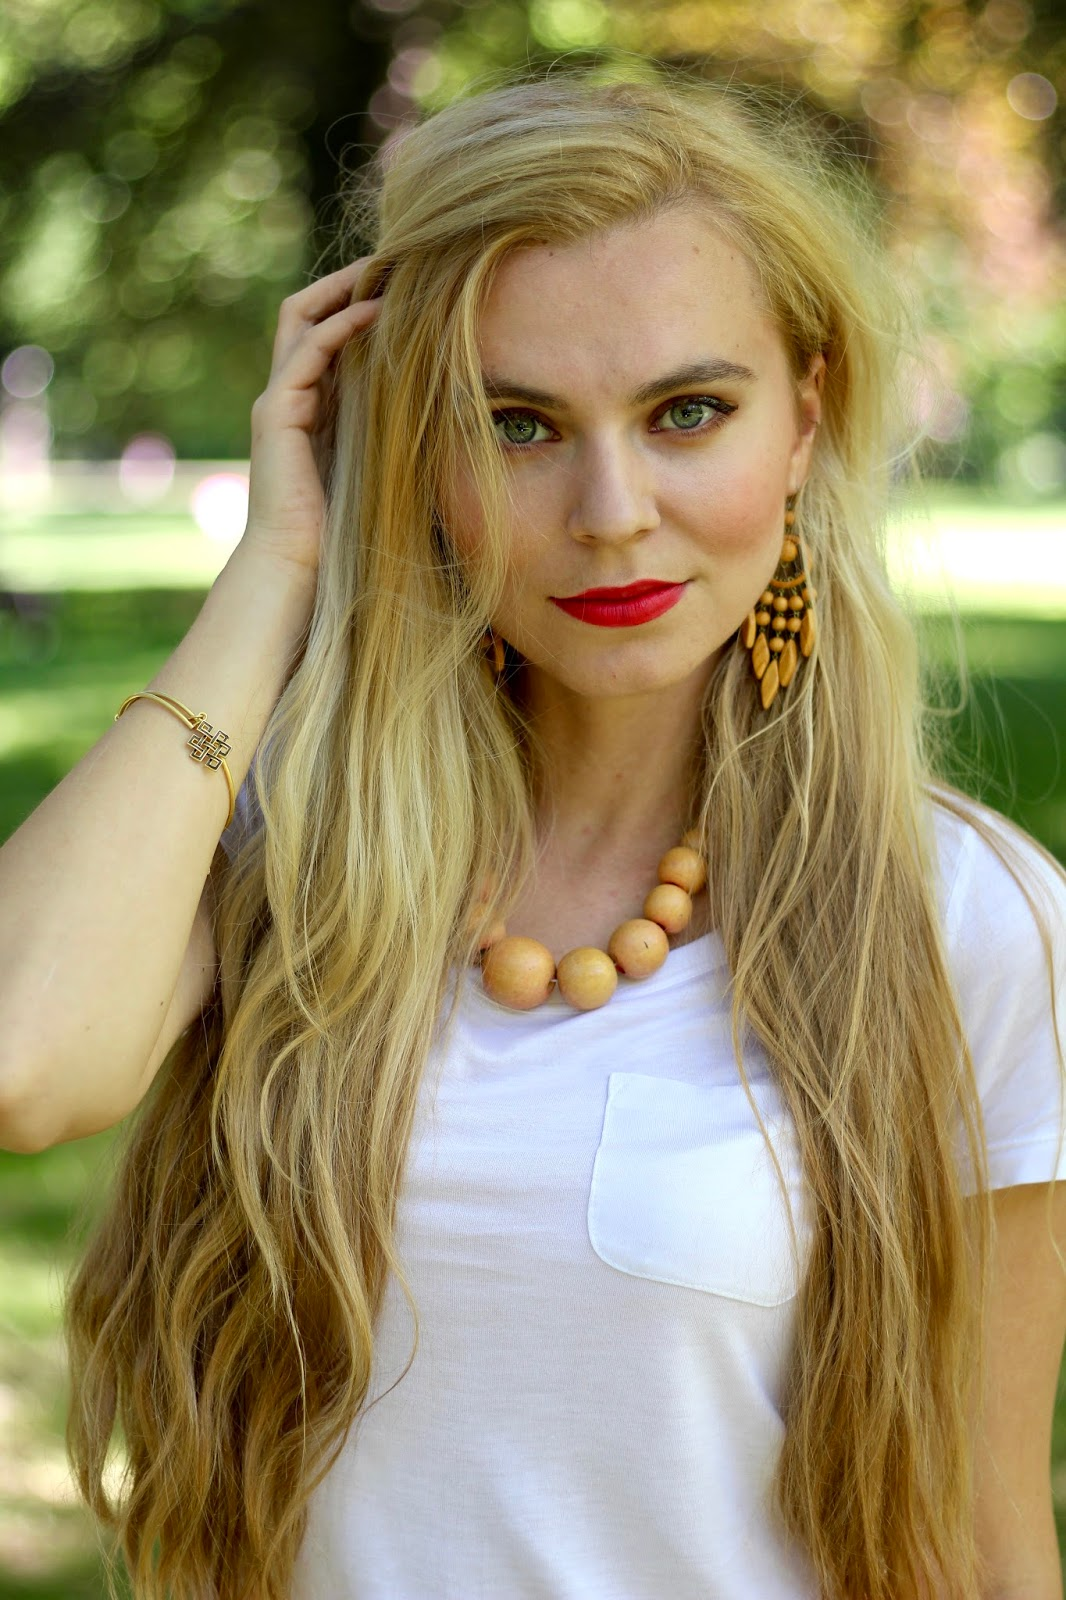 slovenska beauty a modna blogerka. bloger roka 2017 krasa